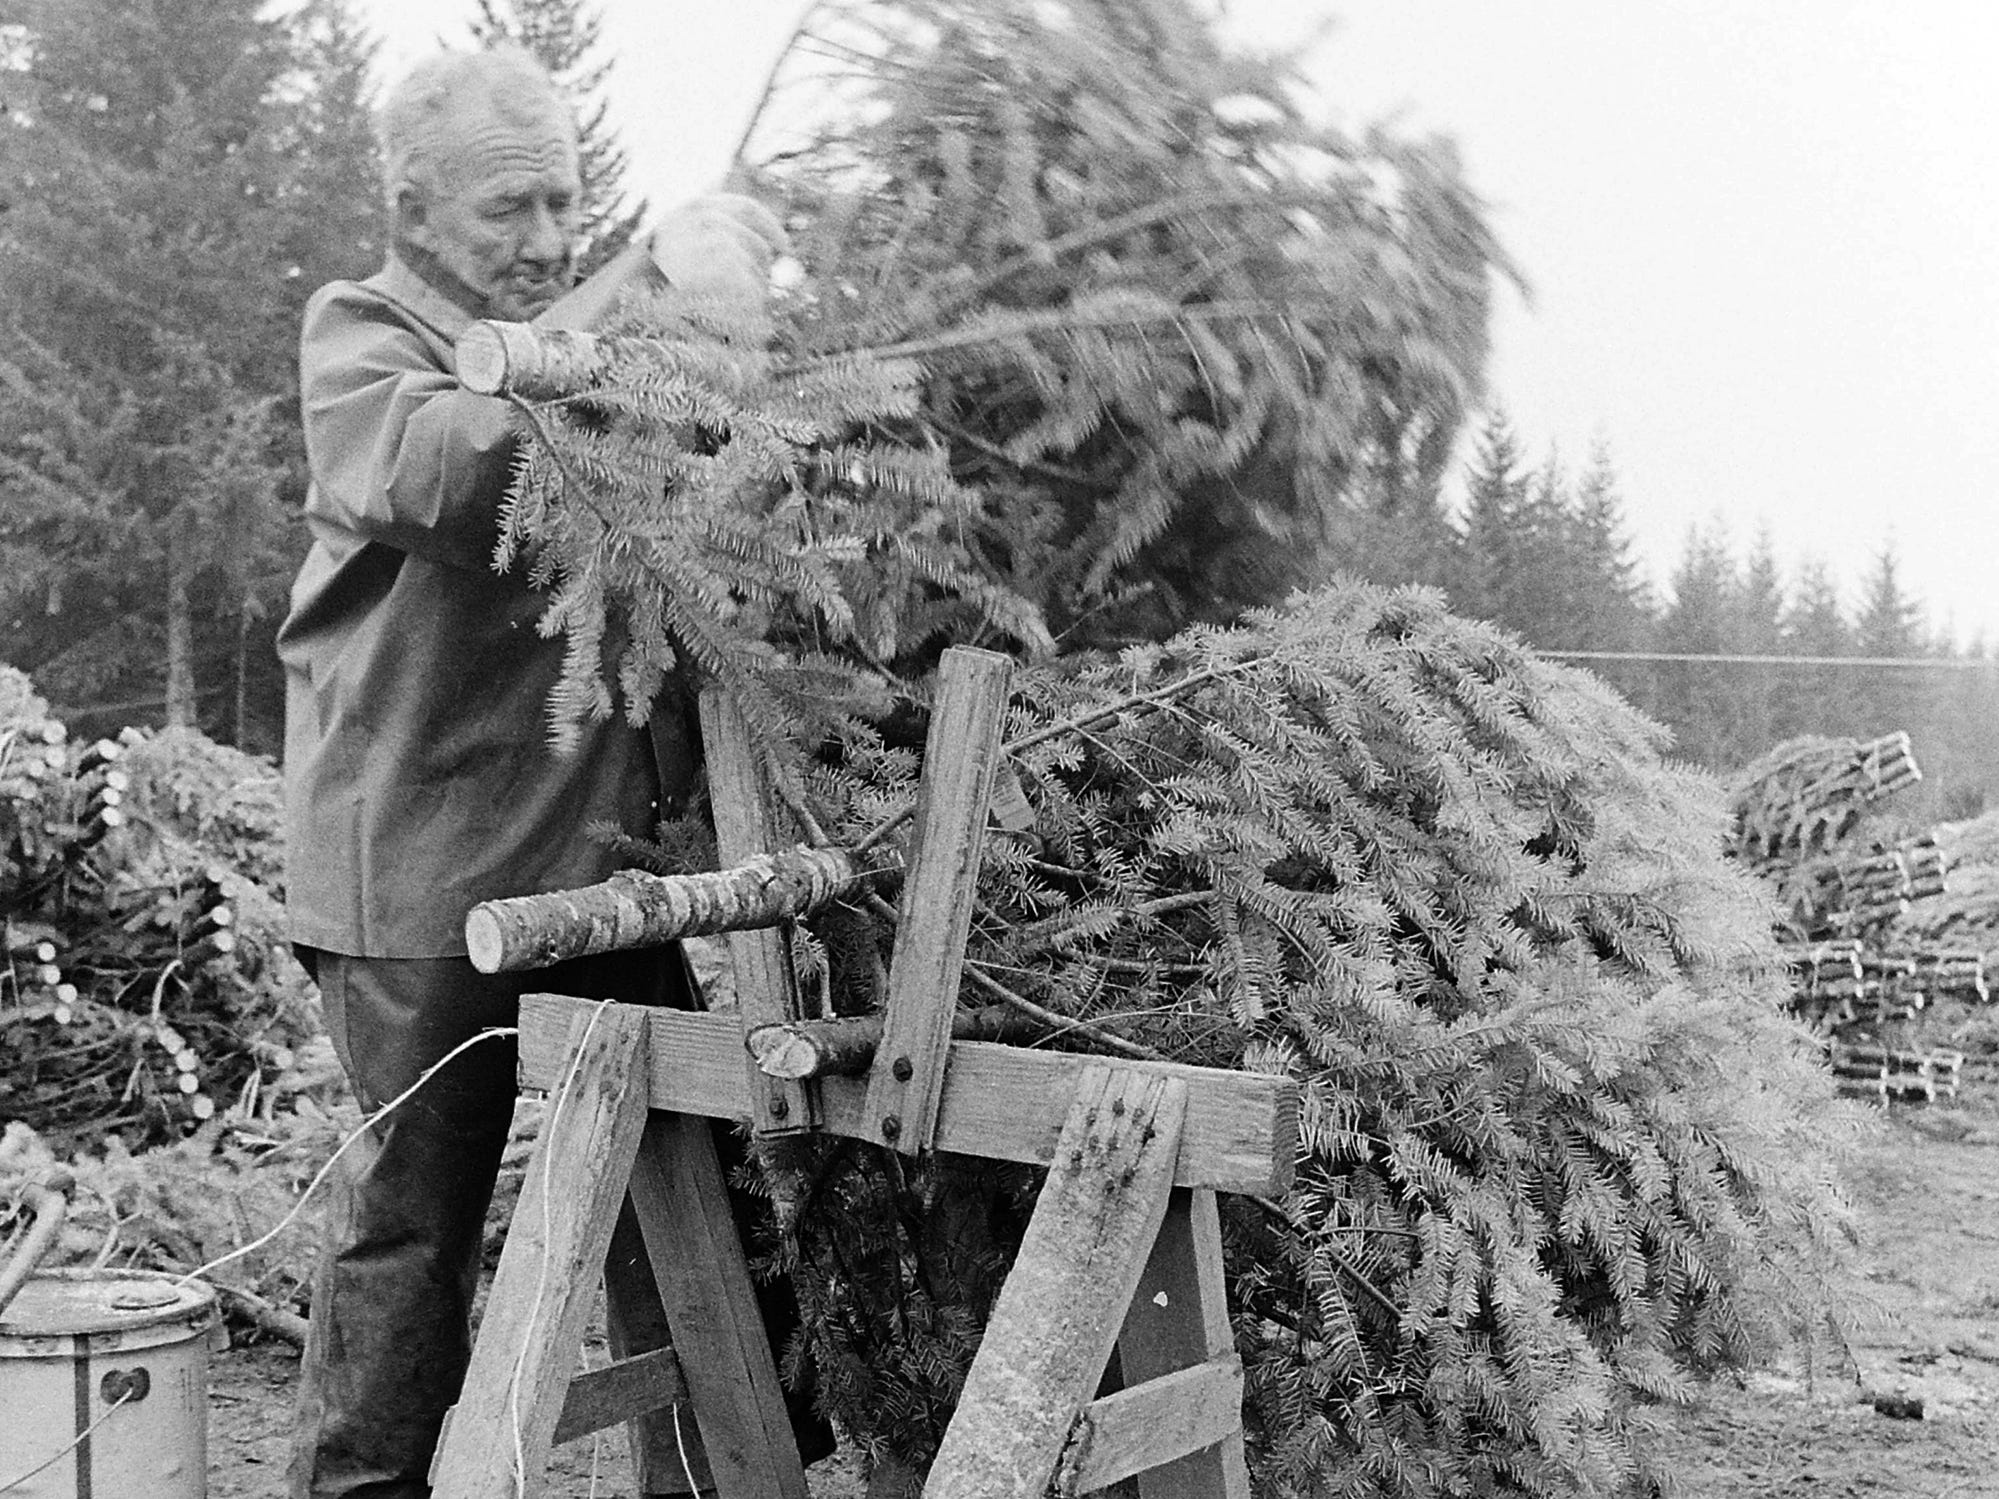 11/20/73Christmas Trees